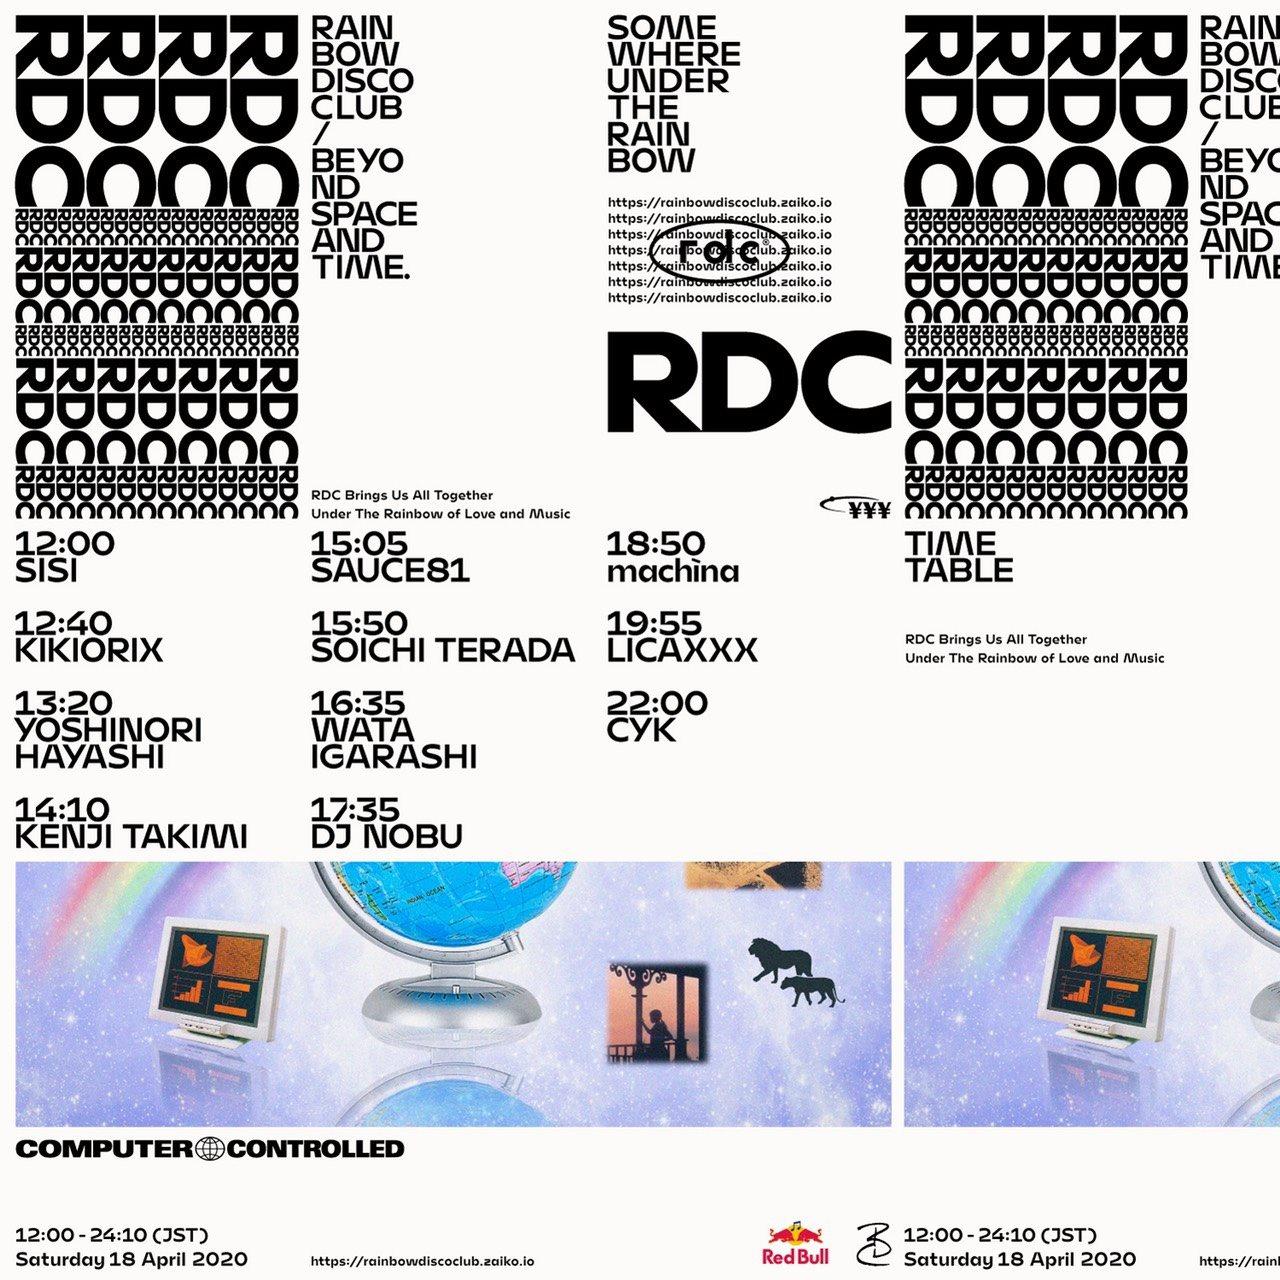 Rainbow Disco Club 'Somewhere Under the Rainbow! - Flyer front